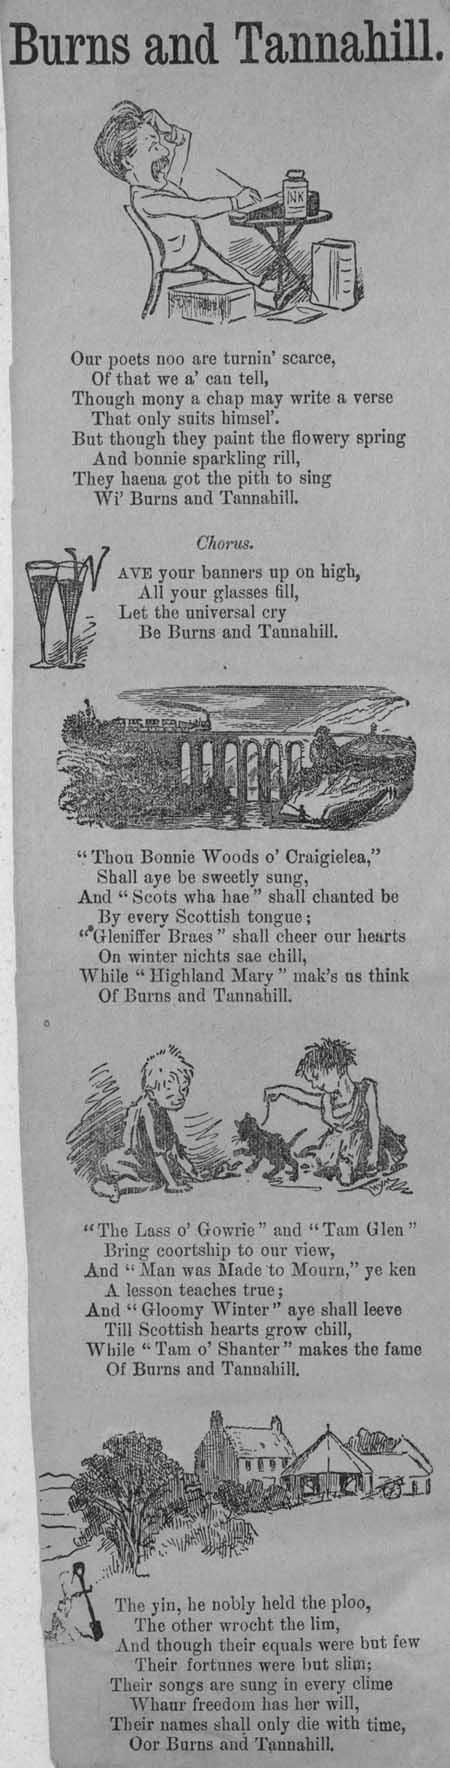 Broadside ballad entitled Burns and 'Tannahill'